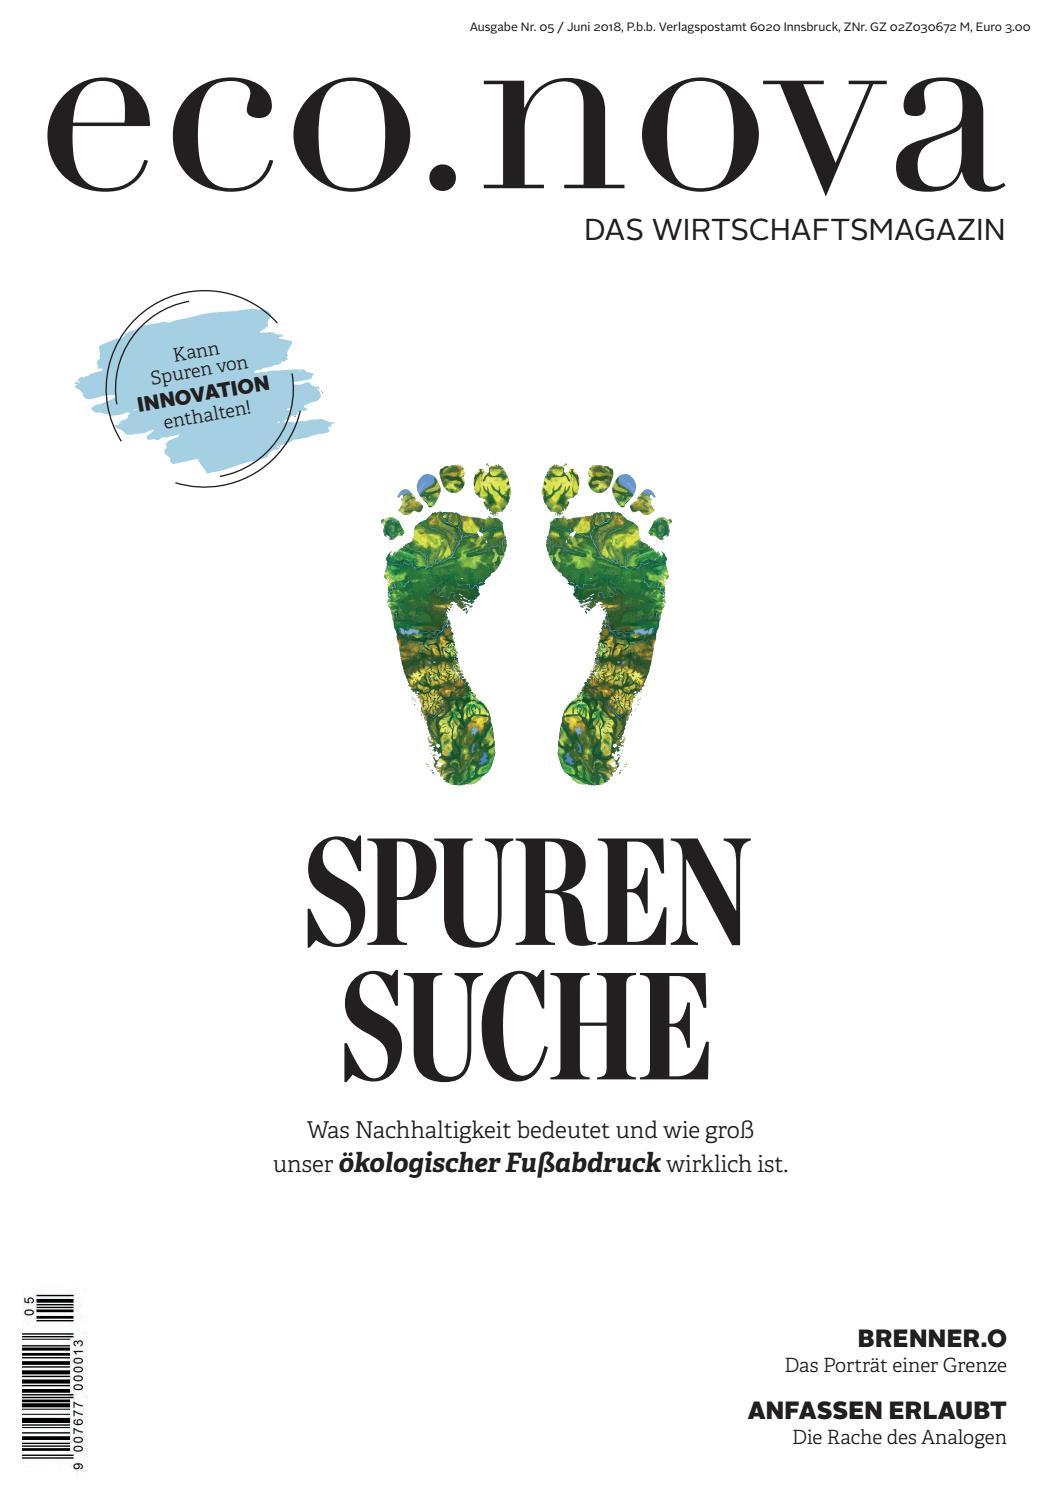 Alpbach studenten dating - Kostenlose singlebrsen ilztal